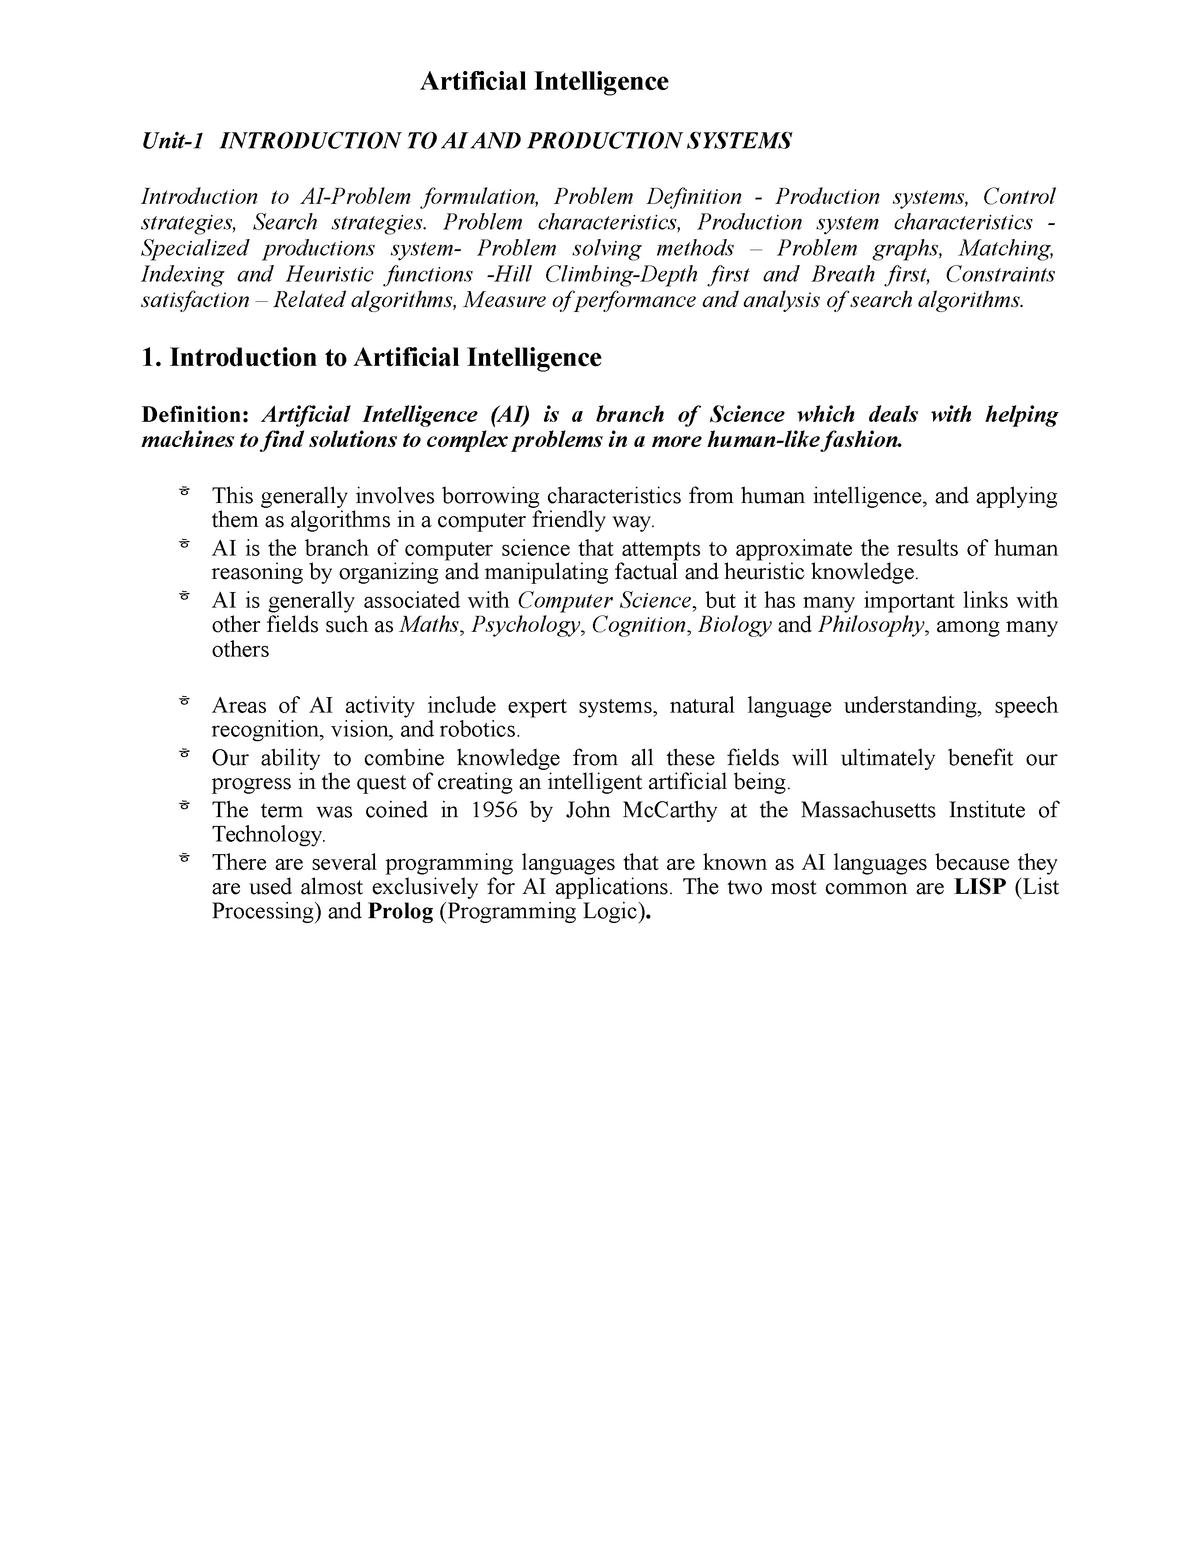 AI-Notes general - Operation management 50250 - StuDocu